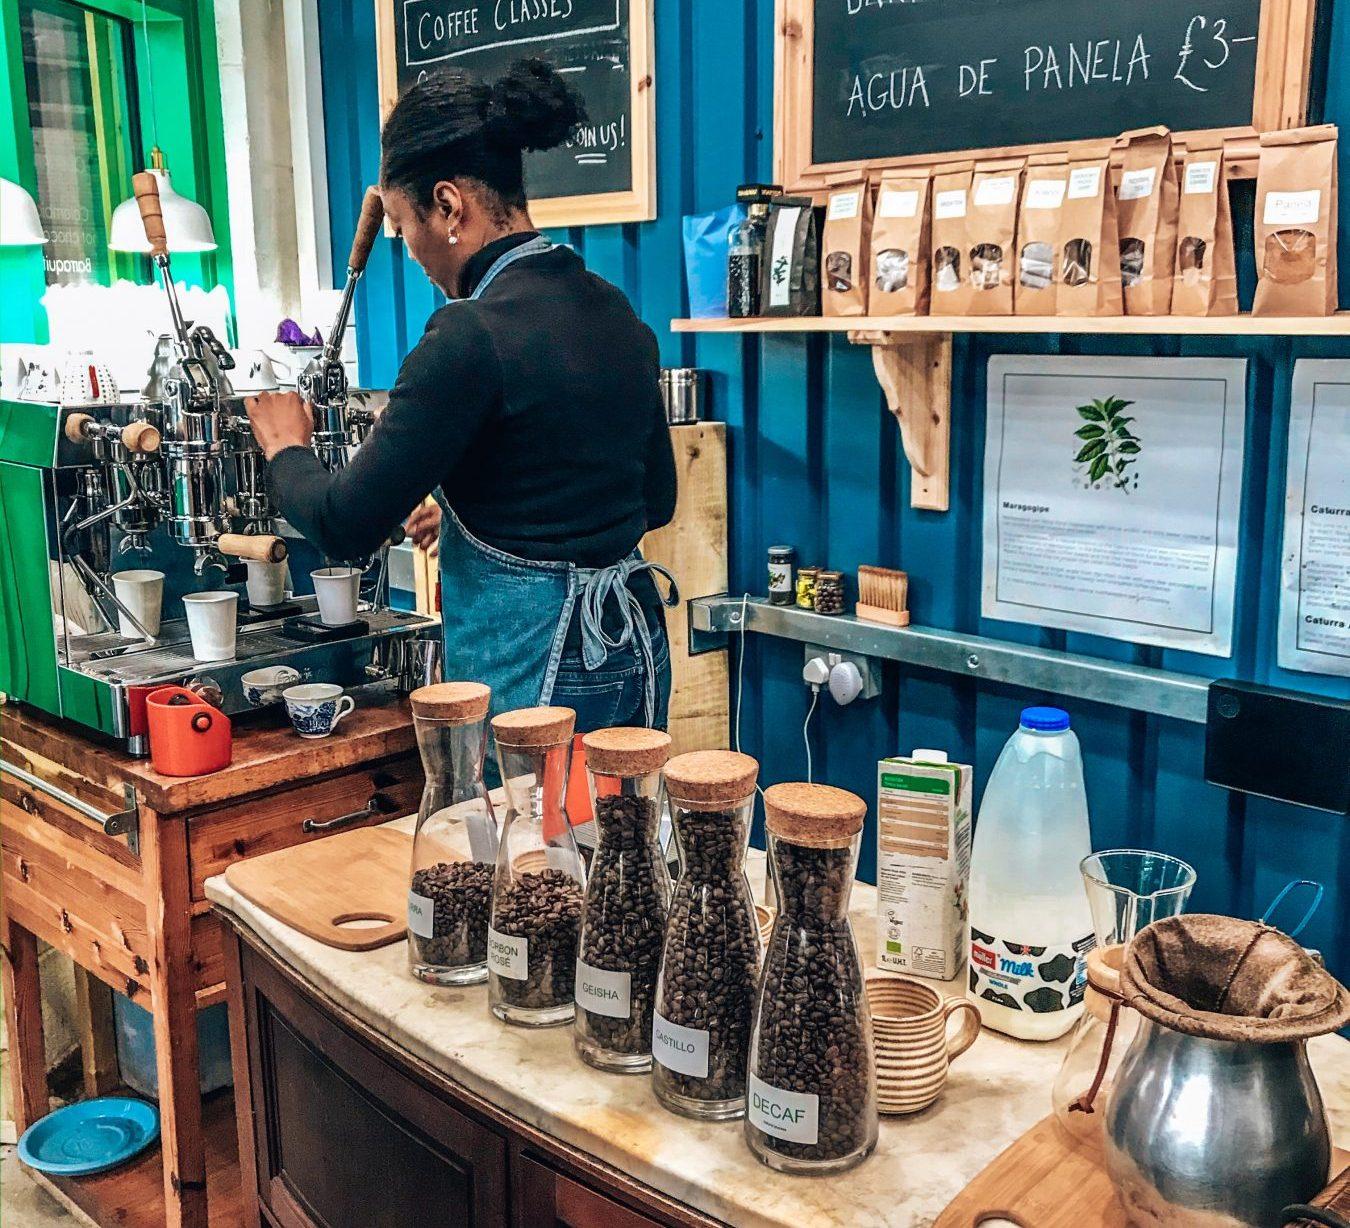 The Colombian Coffee Company